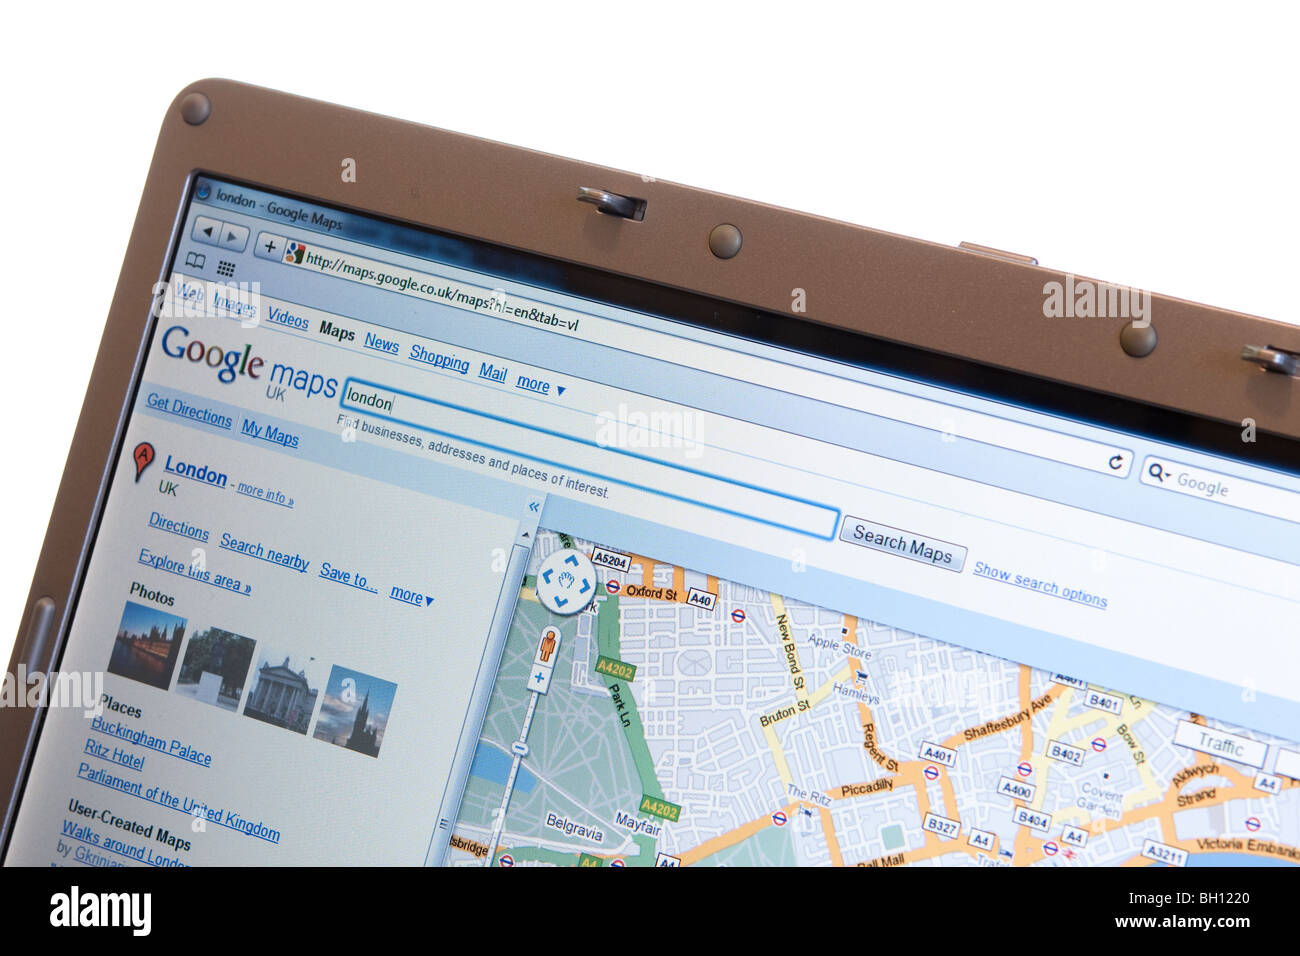 Google maps - website shown on modern laptop Stock Photo: 27683096 on